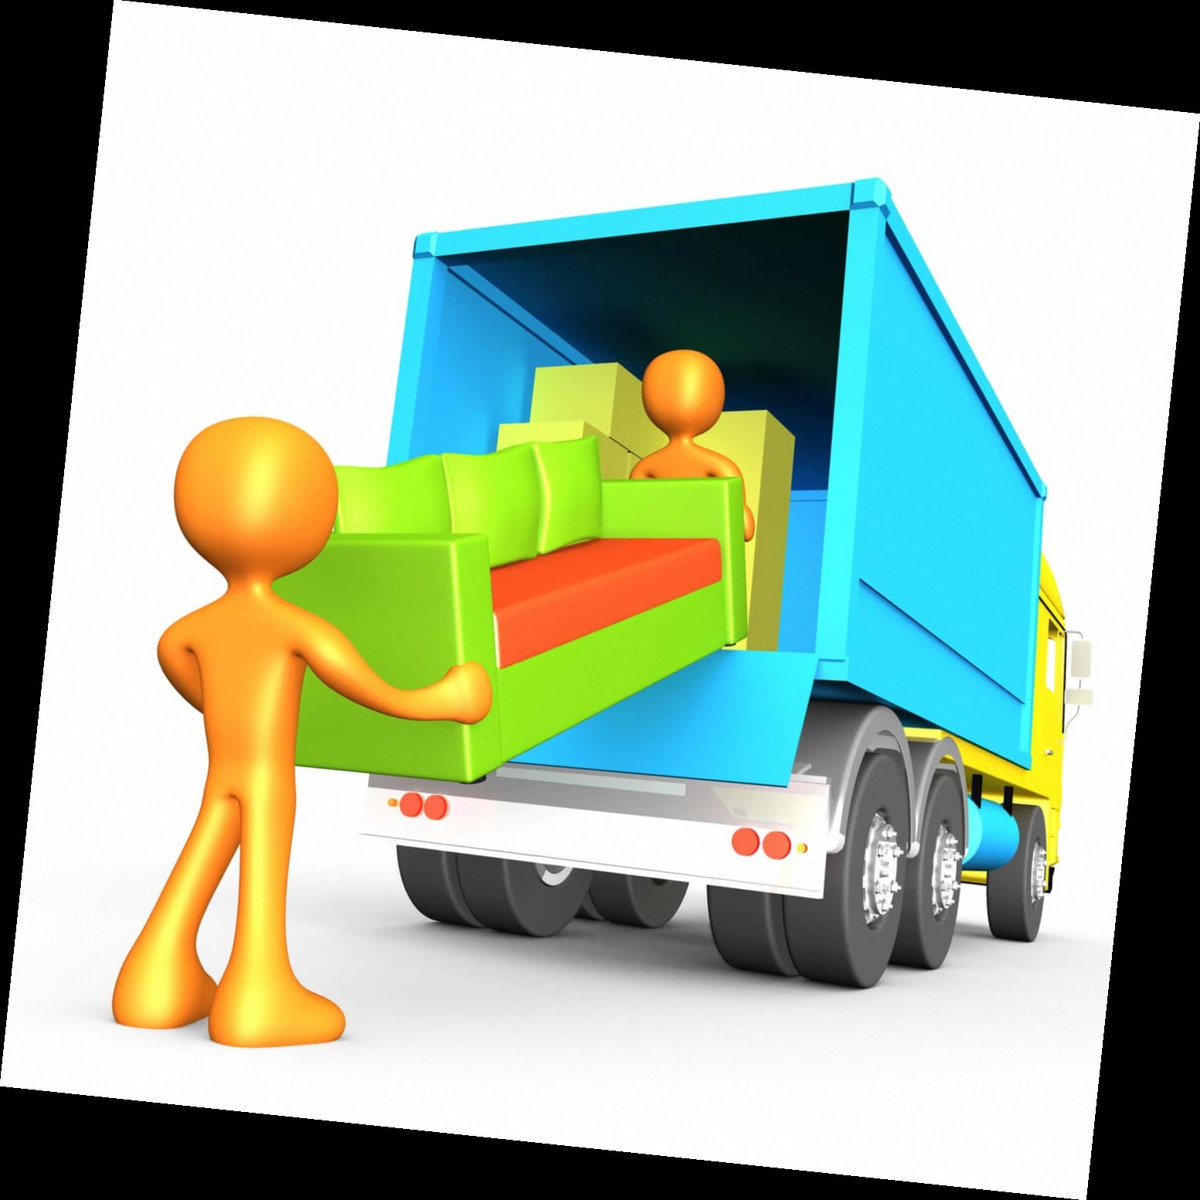 Enjoyable Furniture Movers Bradenton Fl Mo 1 855 789 2734 Jeremy Download Free Architecture Designs Scobabritishbridgeorg